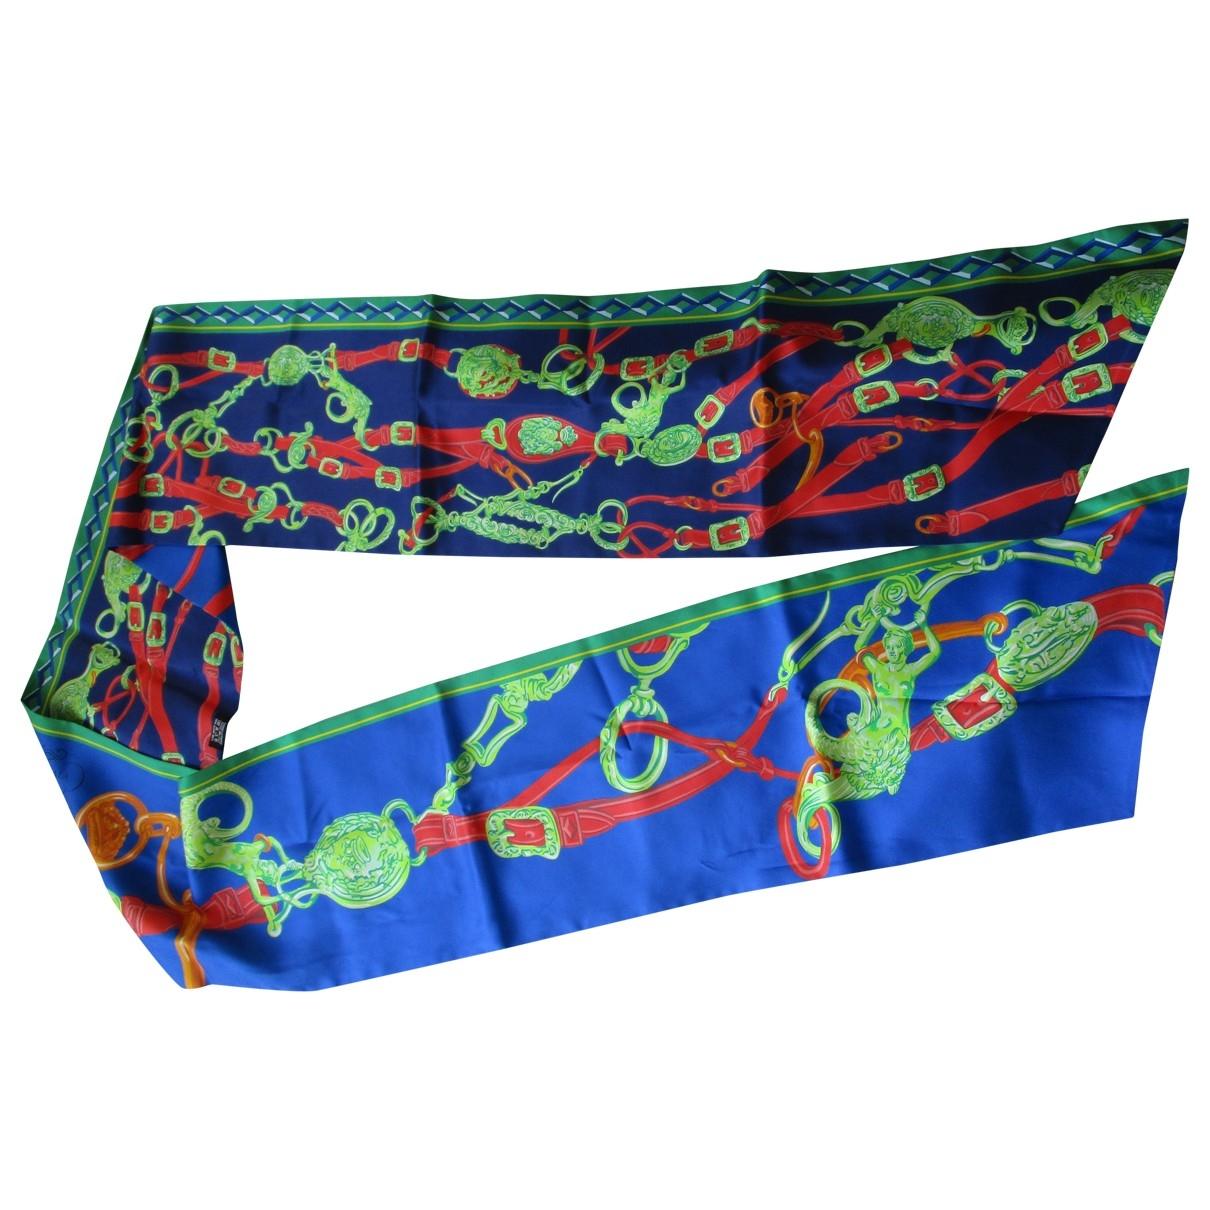 Hermes - Foulard Maxi twilly pour femme en soie - bleu